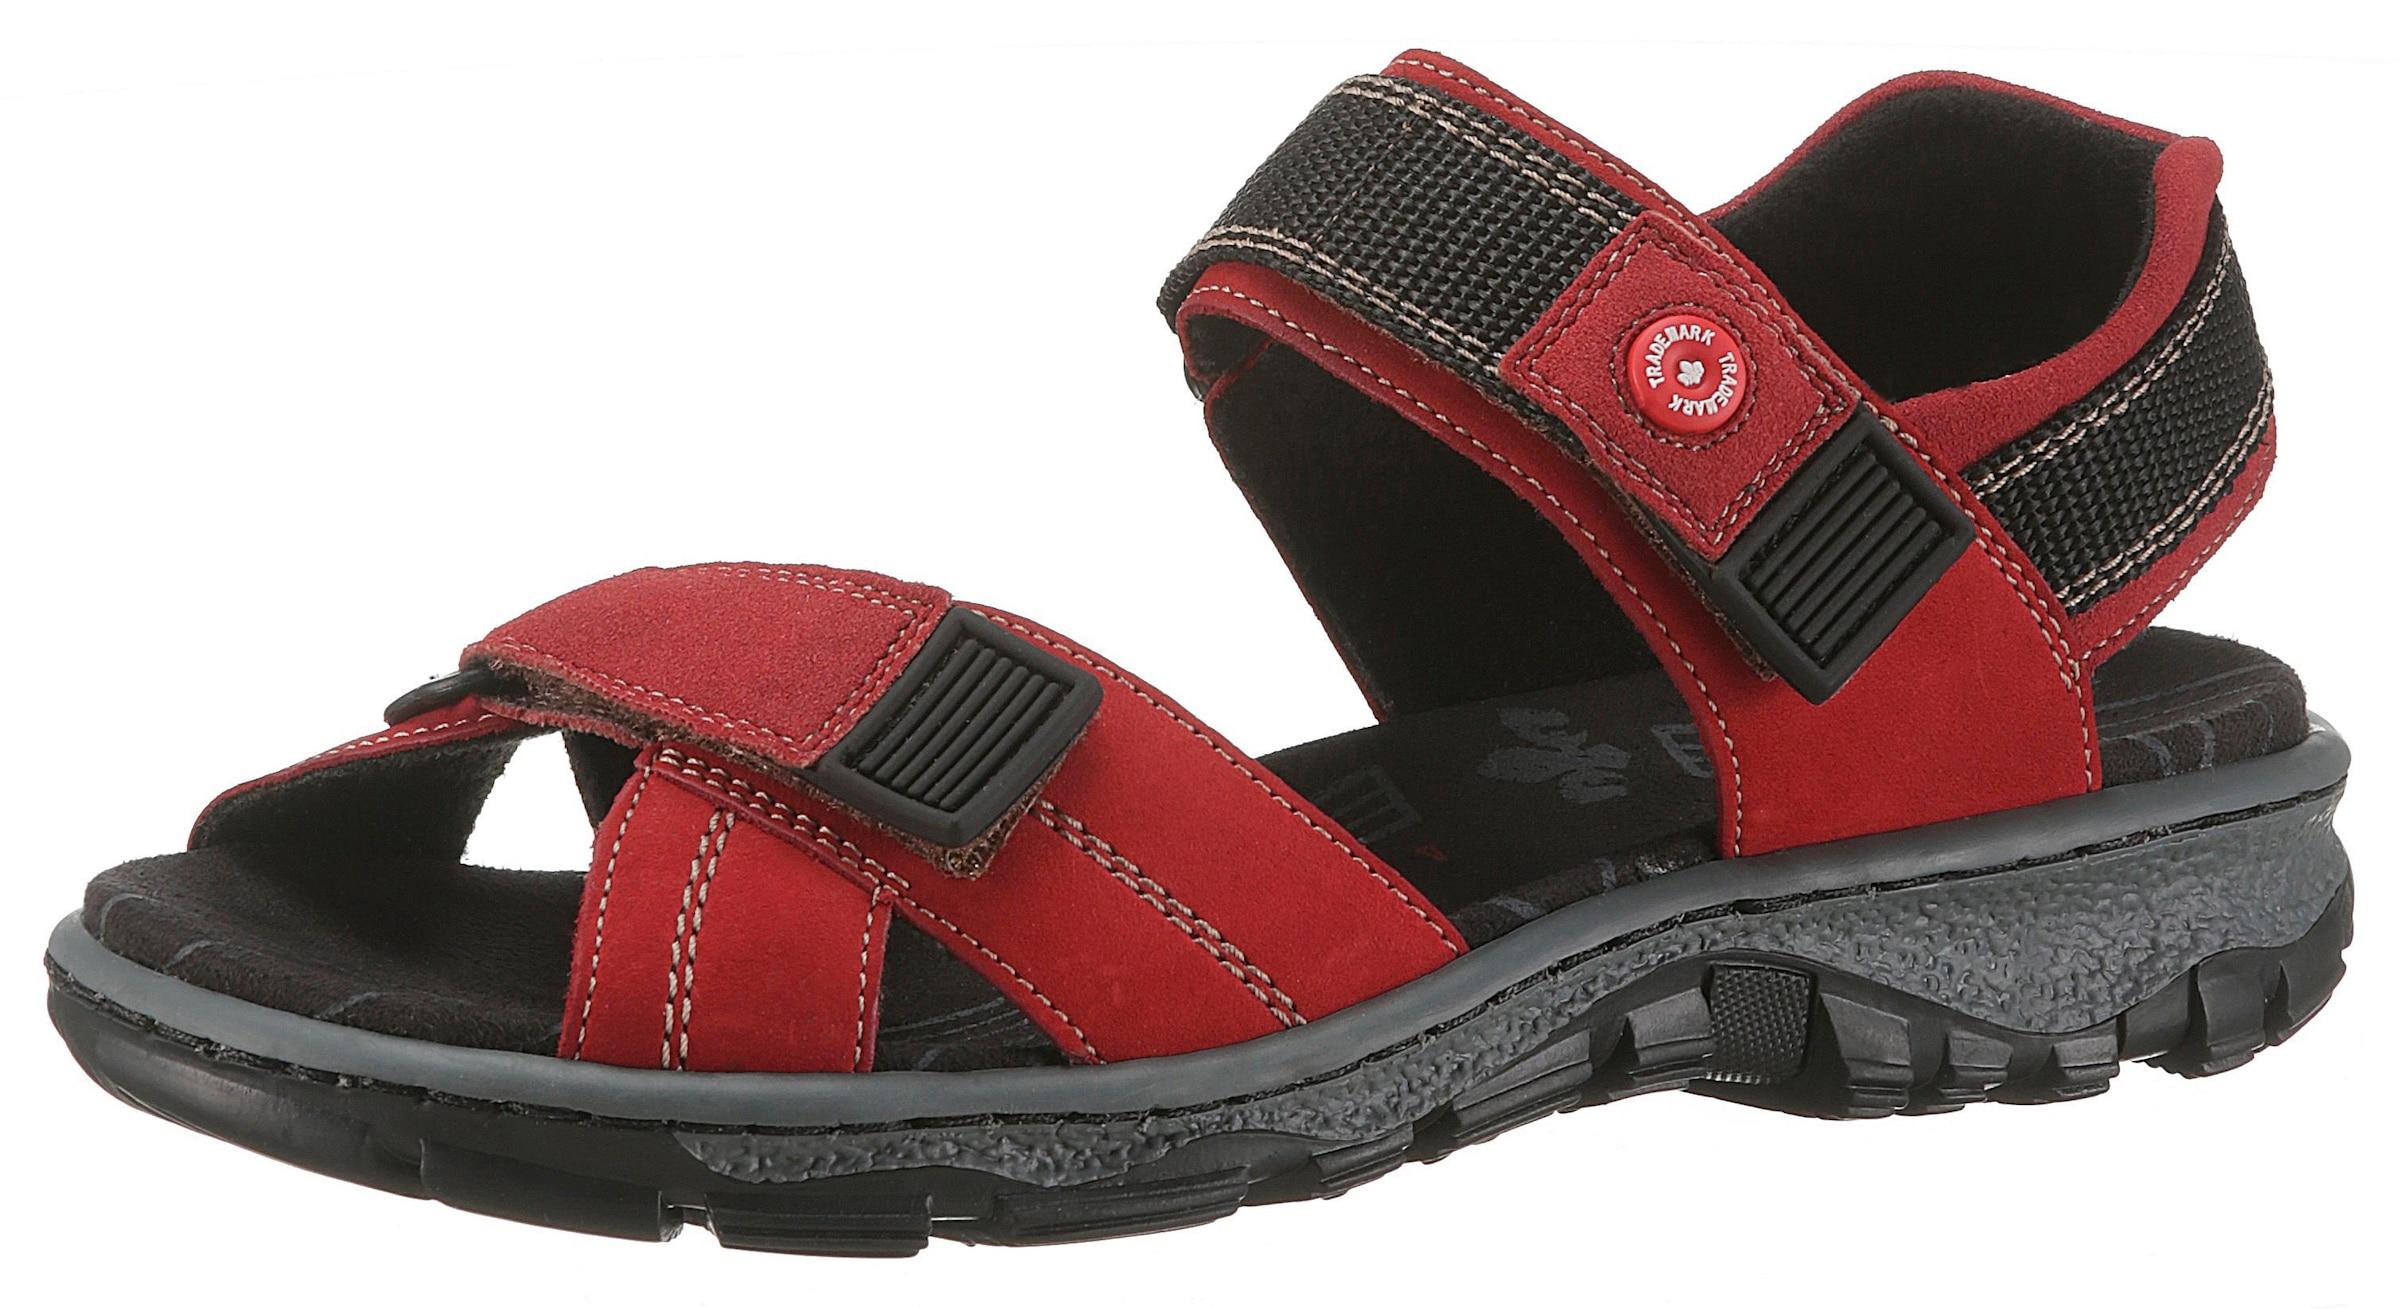 Outdoor Sandalen Damen Damenmode Schuhe Outdoorsandale Sandale Rieker Details Zu lJFc3K1T